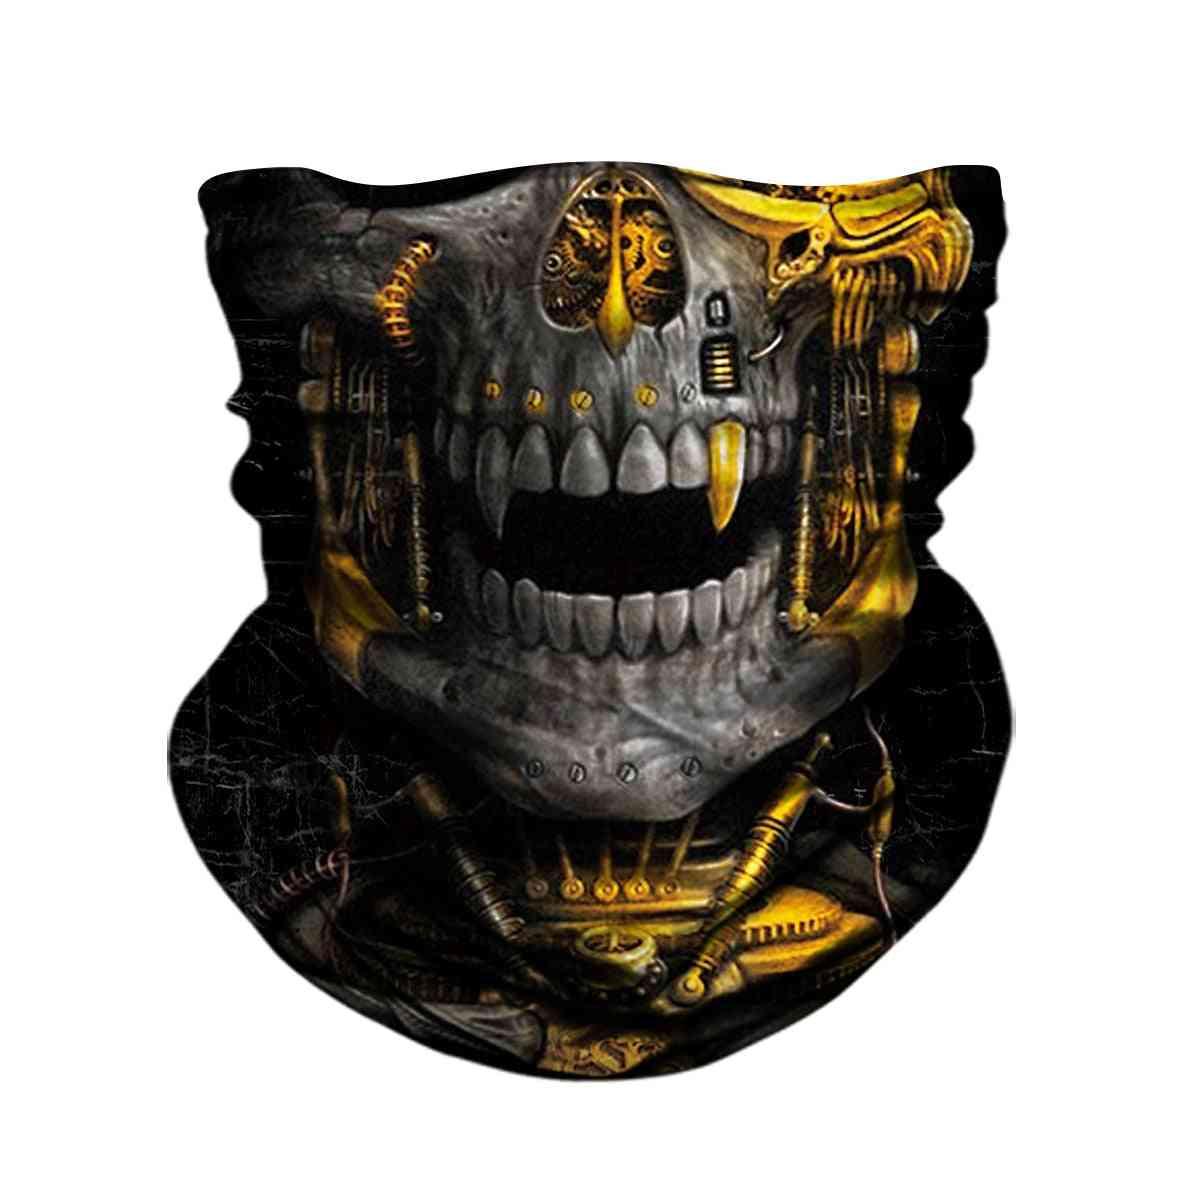 3d- Skull Skeleton Balaclava, Seamless Face Shield Mask, Scarf Headband For Outdoor